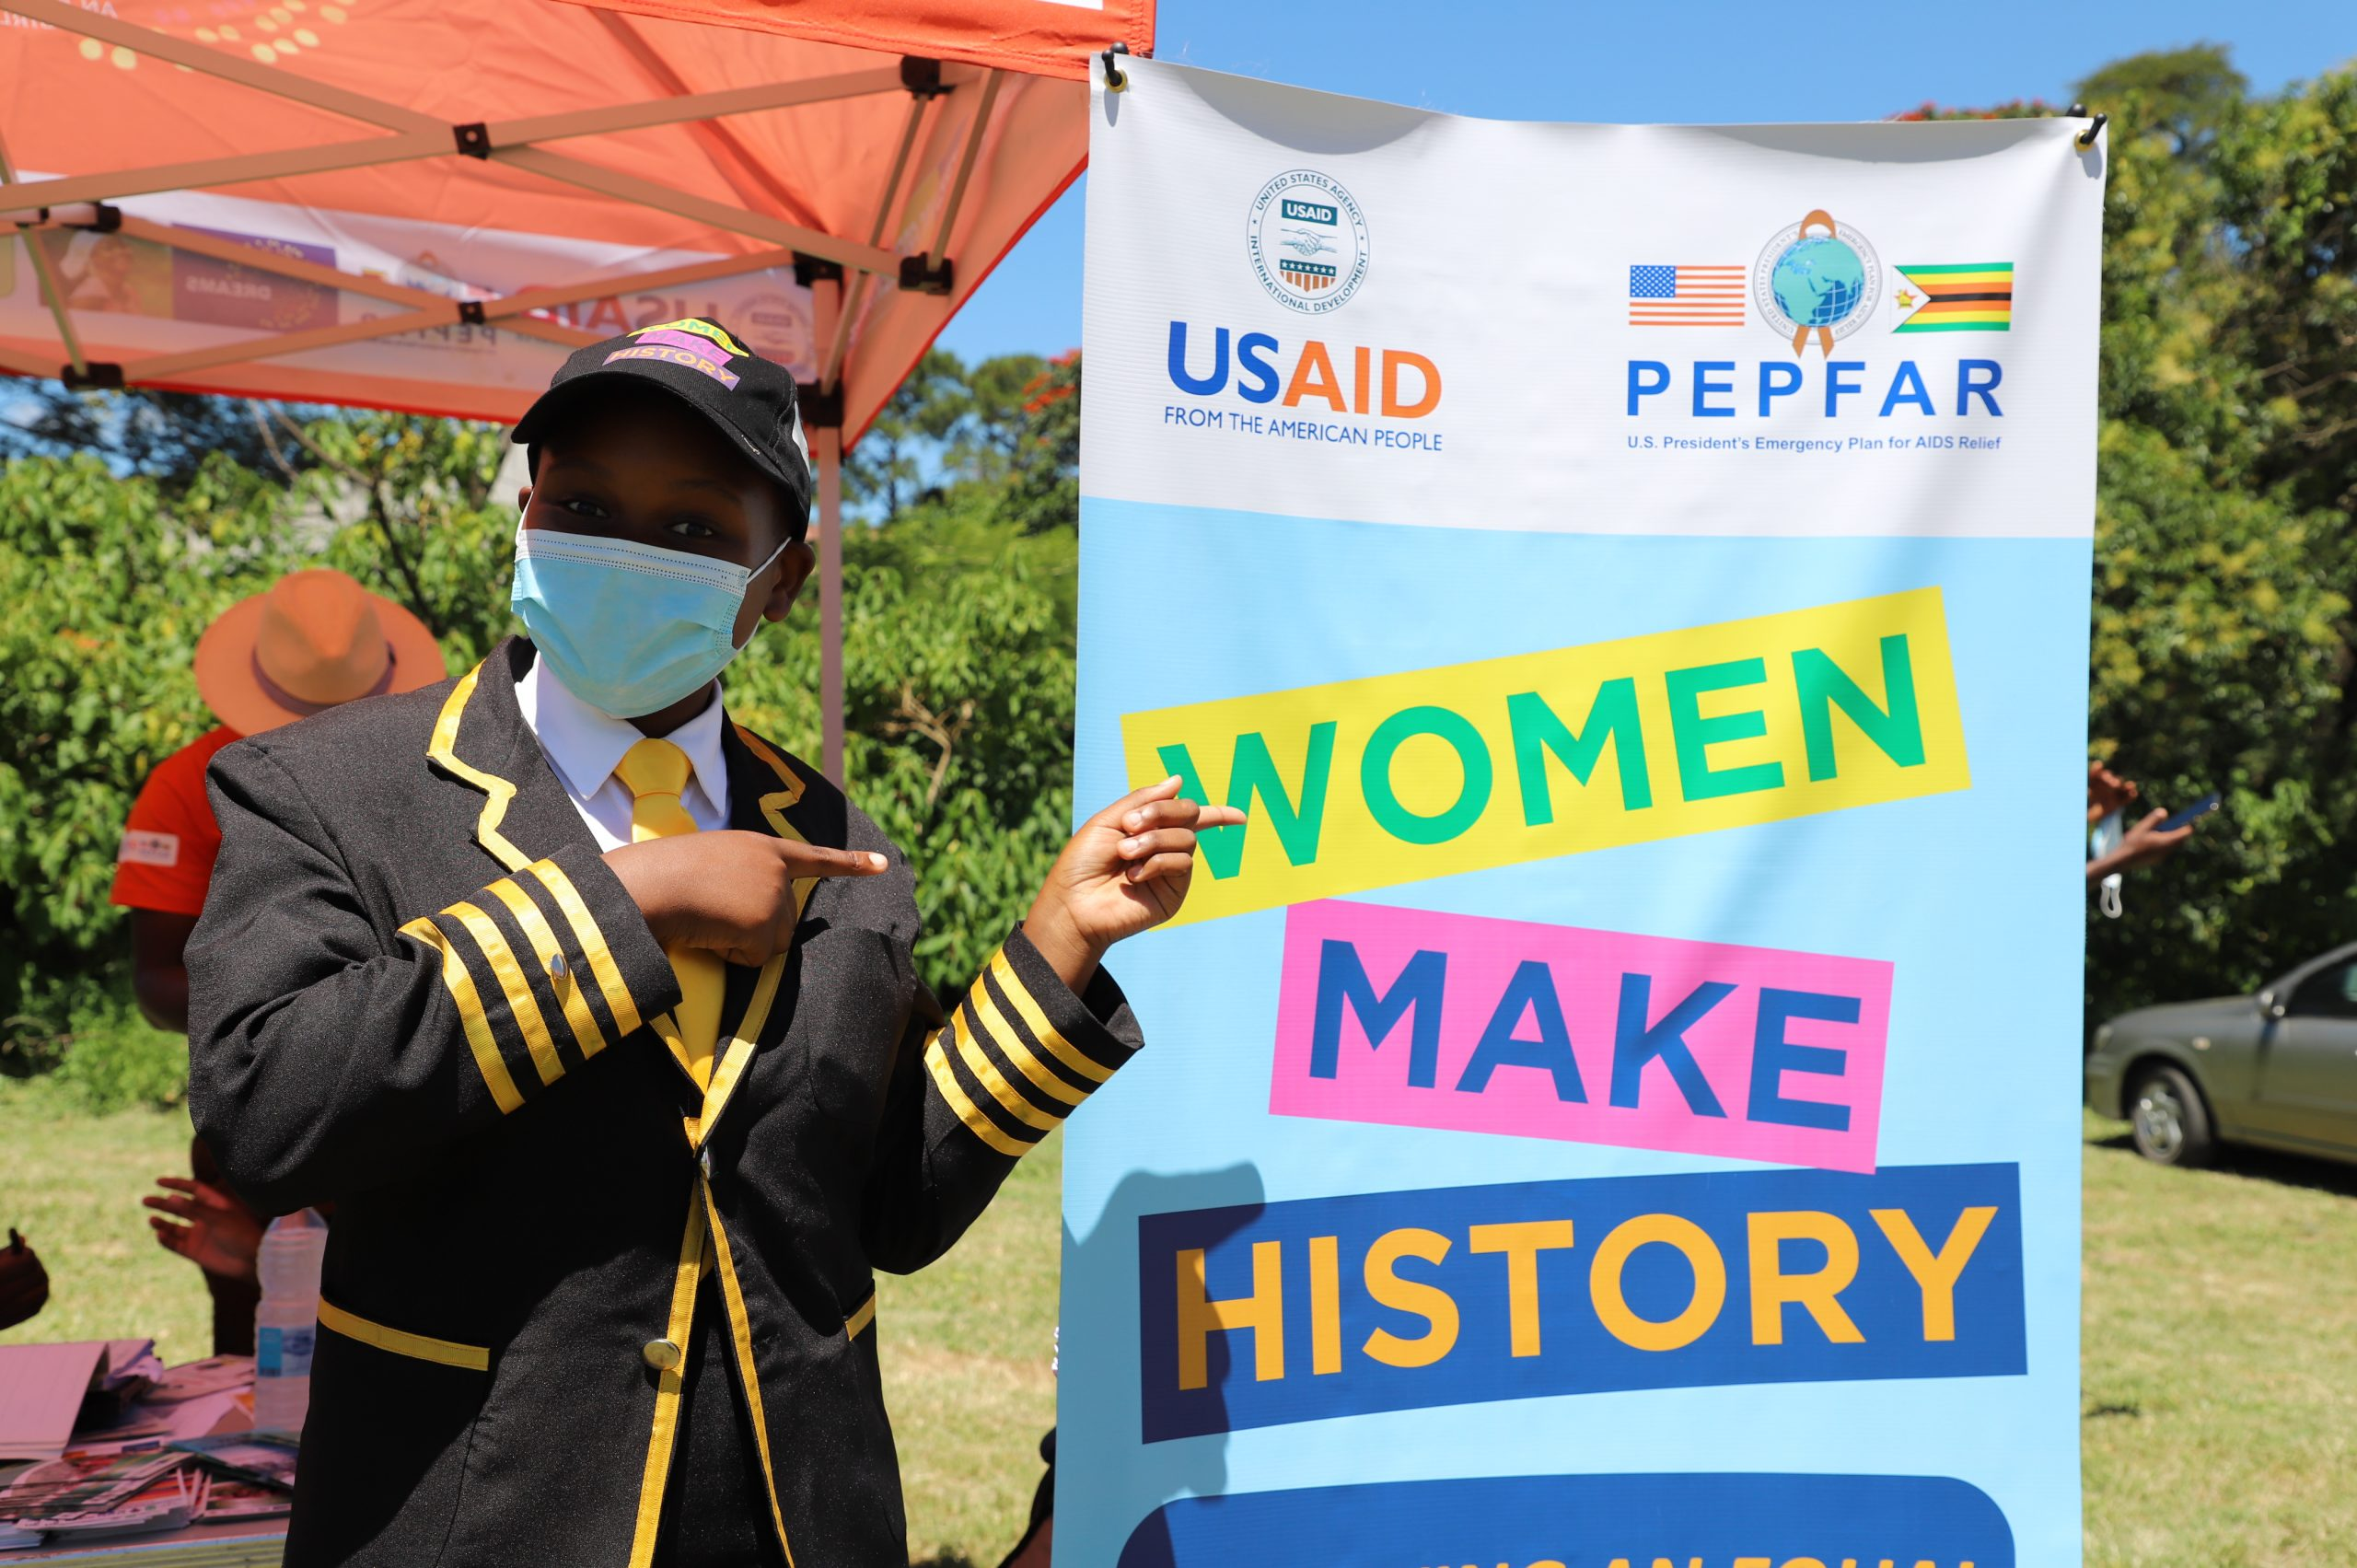 #ChooseToChallenge:Celebrating girls and women